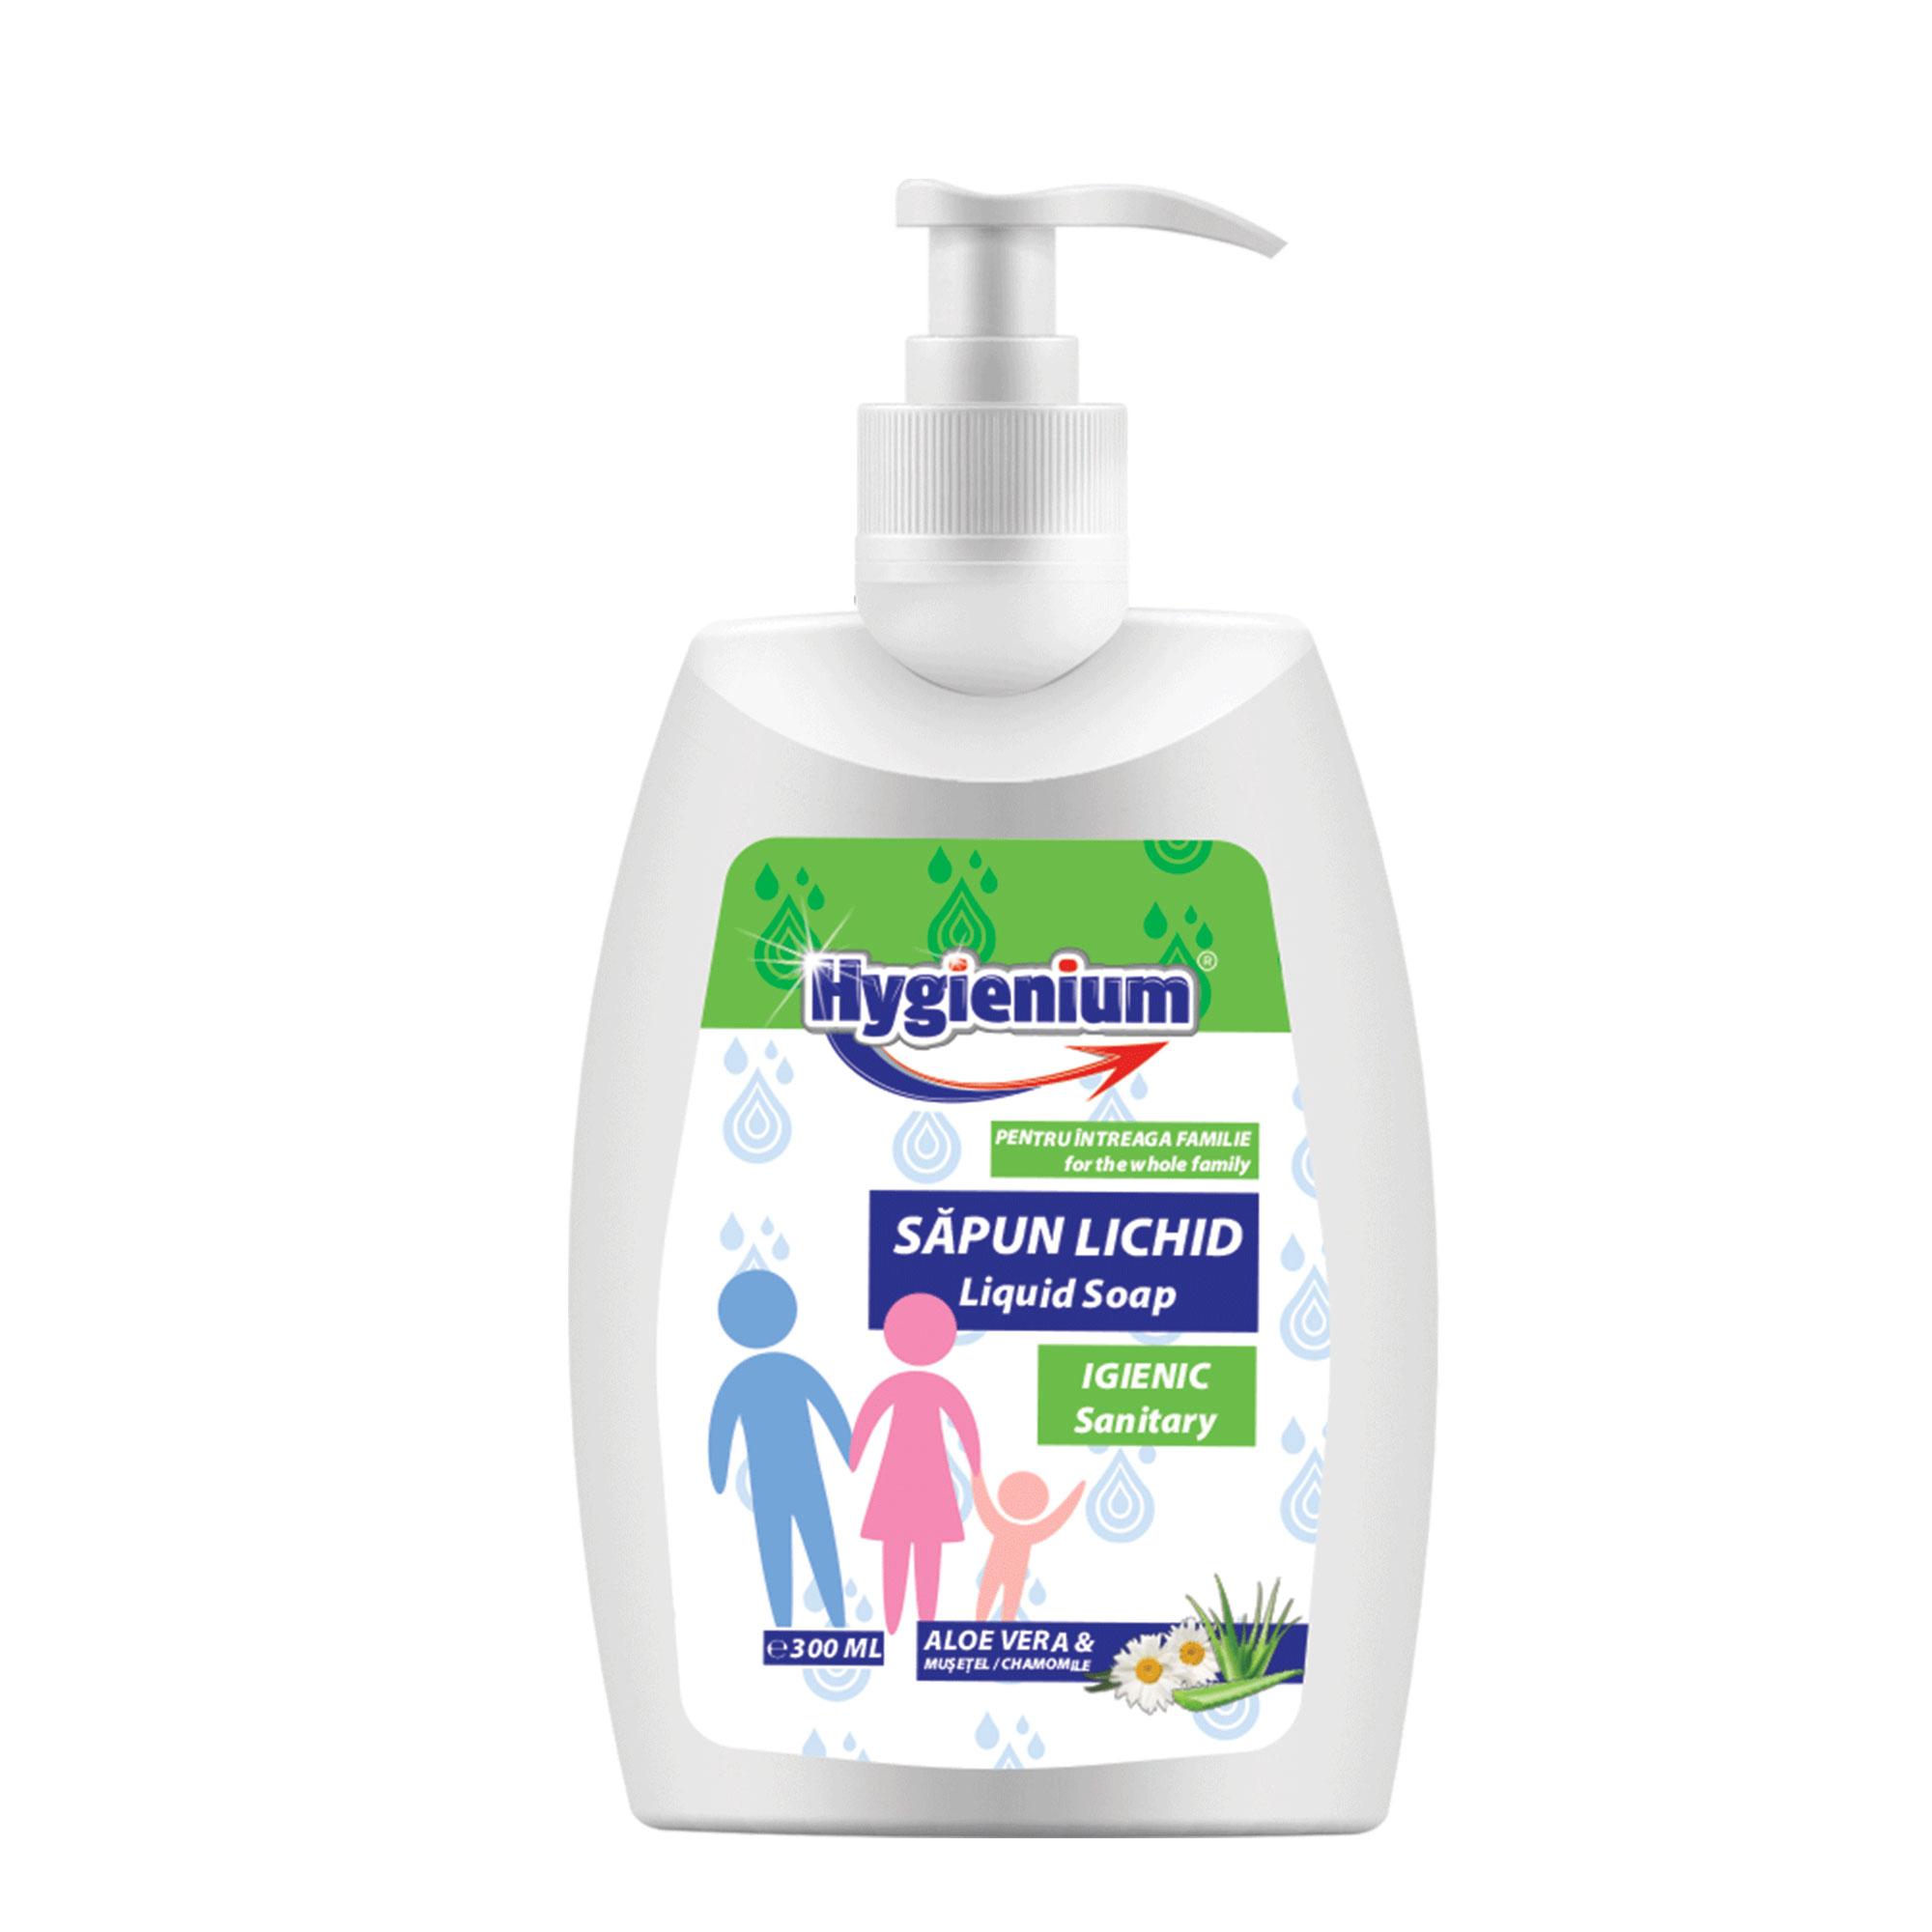 Hygienium Liquid Soap Aloe Vera & Camomile